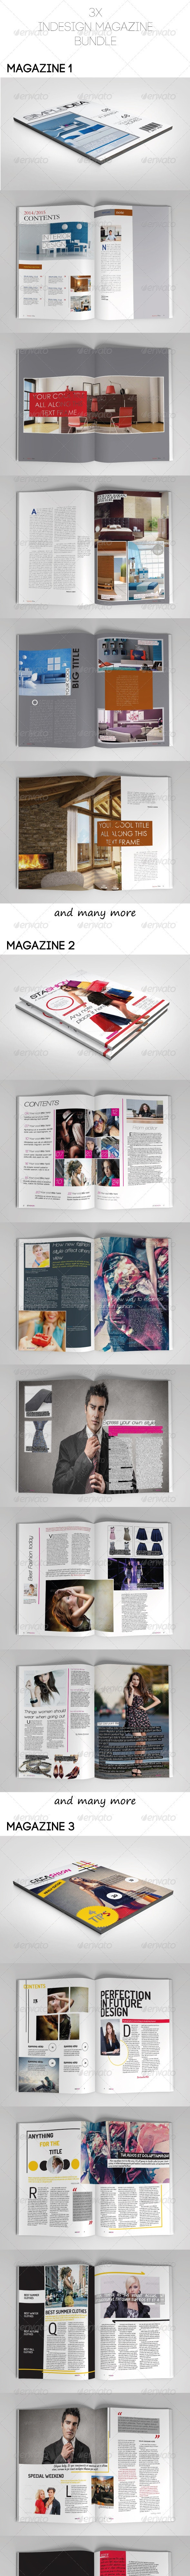 Magazine Bundle Vol.02 - Magazines Print Templates